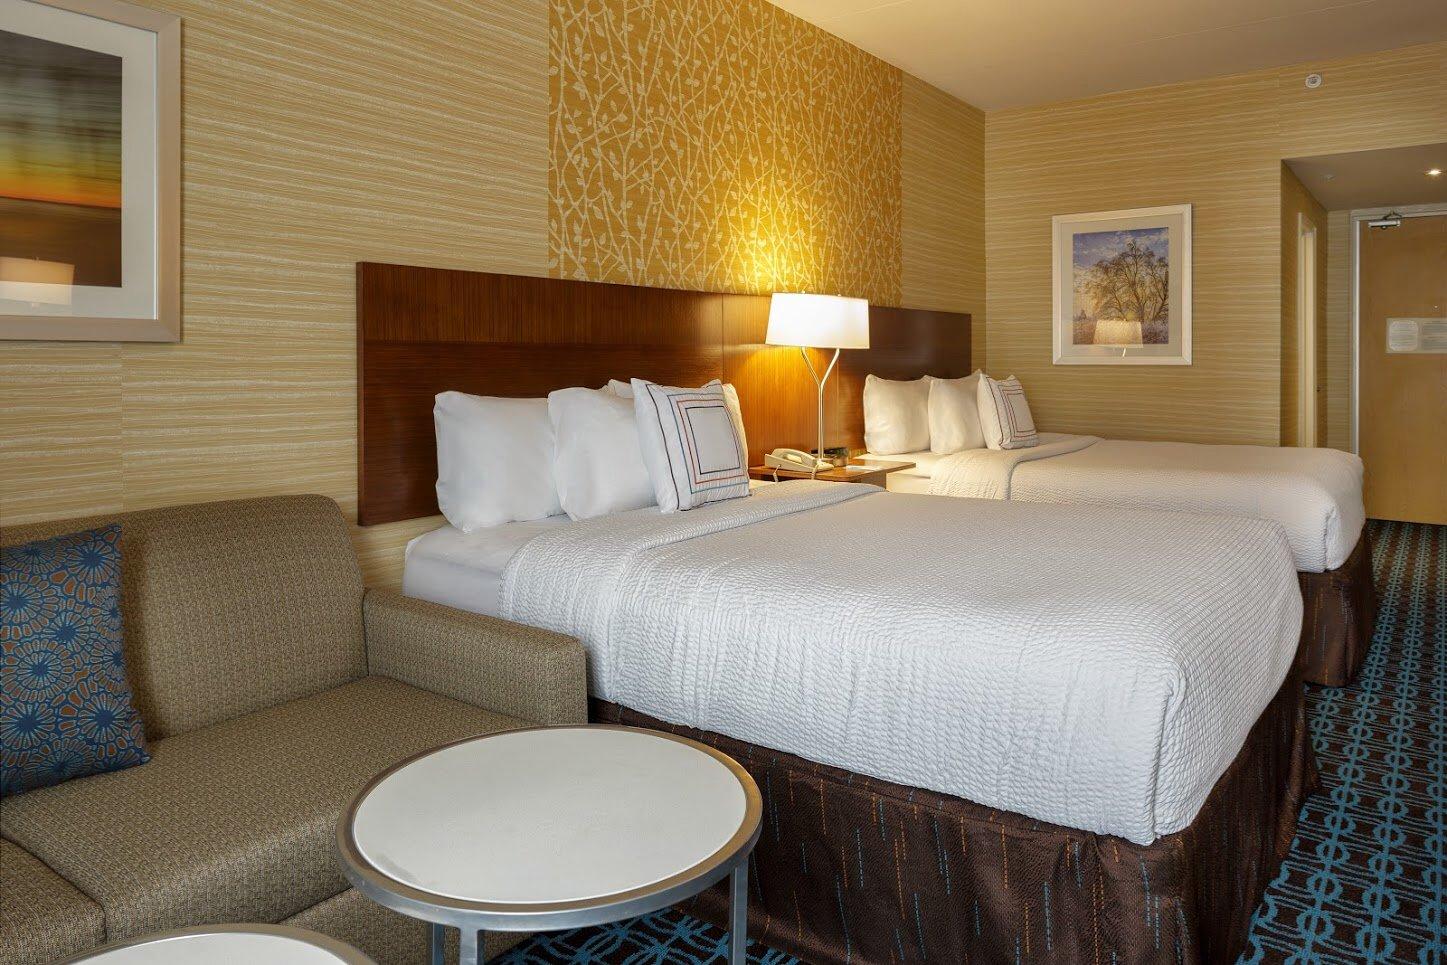 Fairfield Inn & Suites Belleville